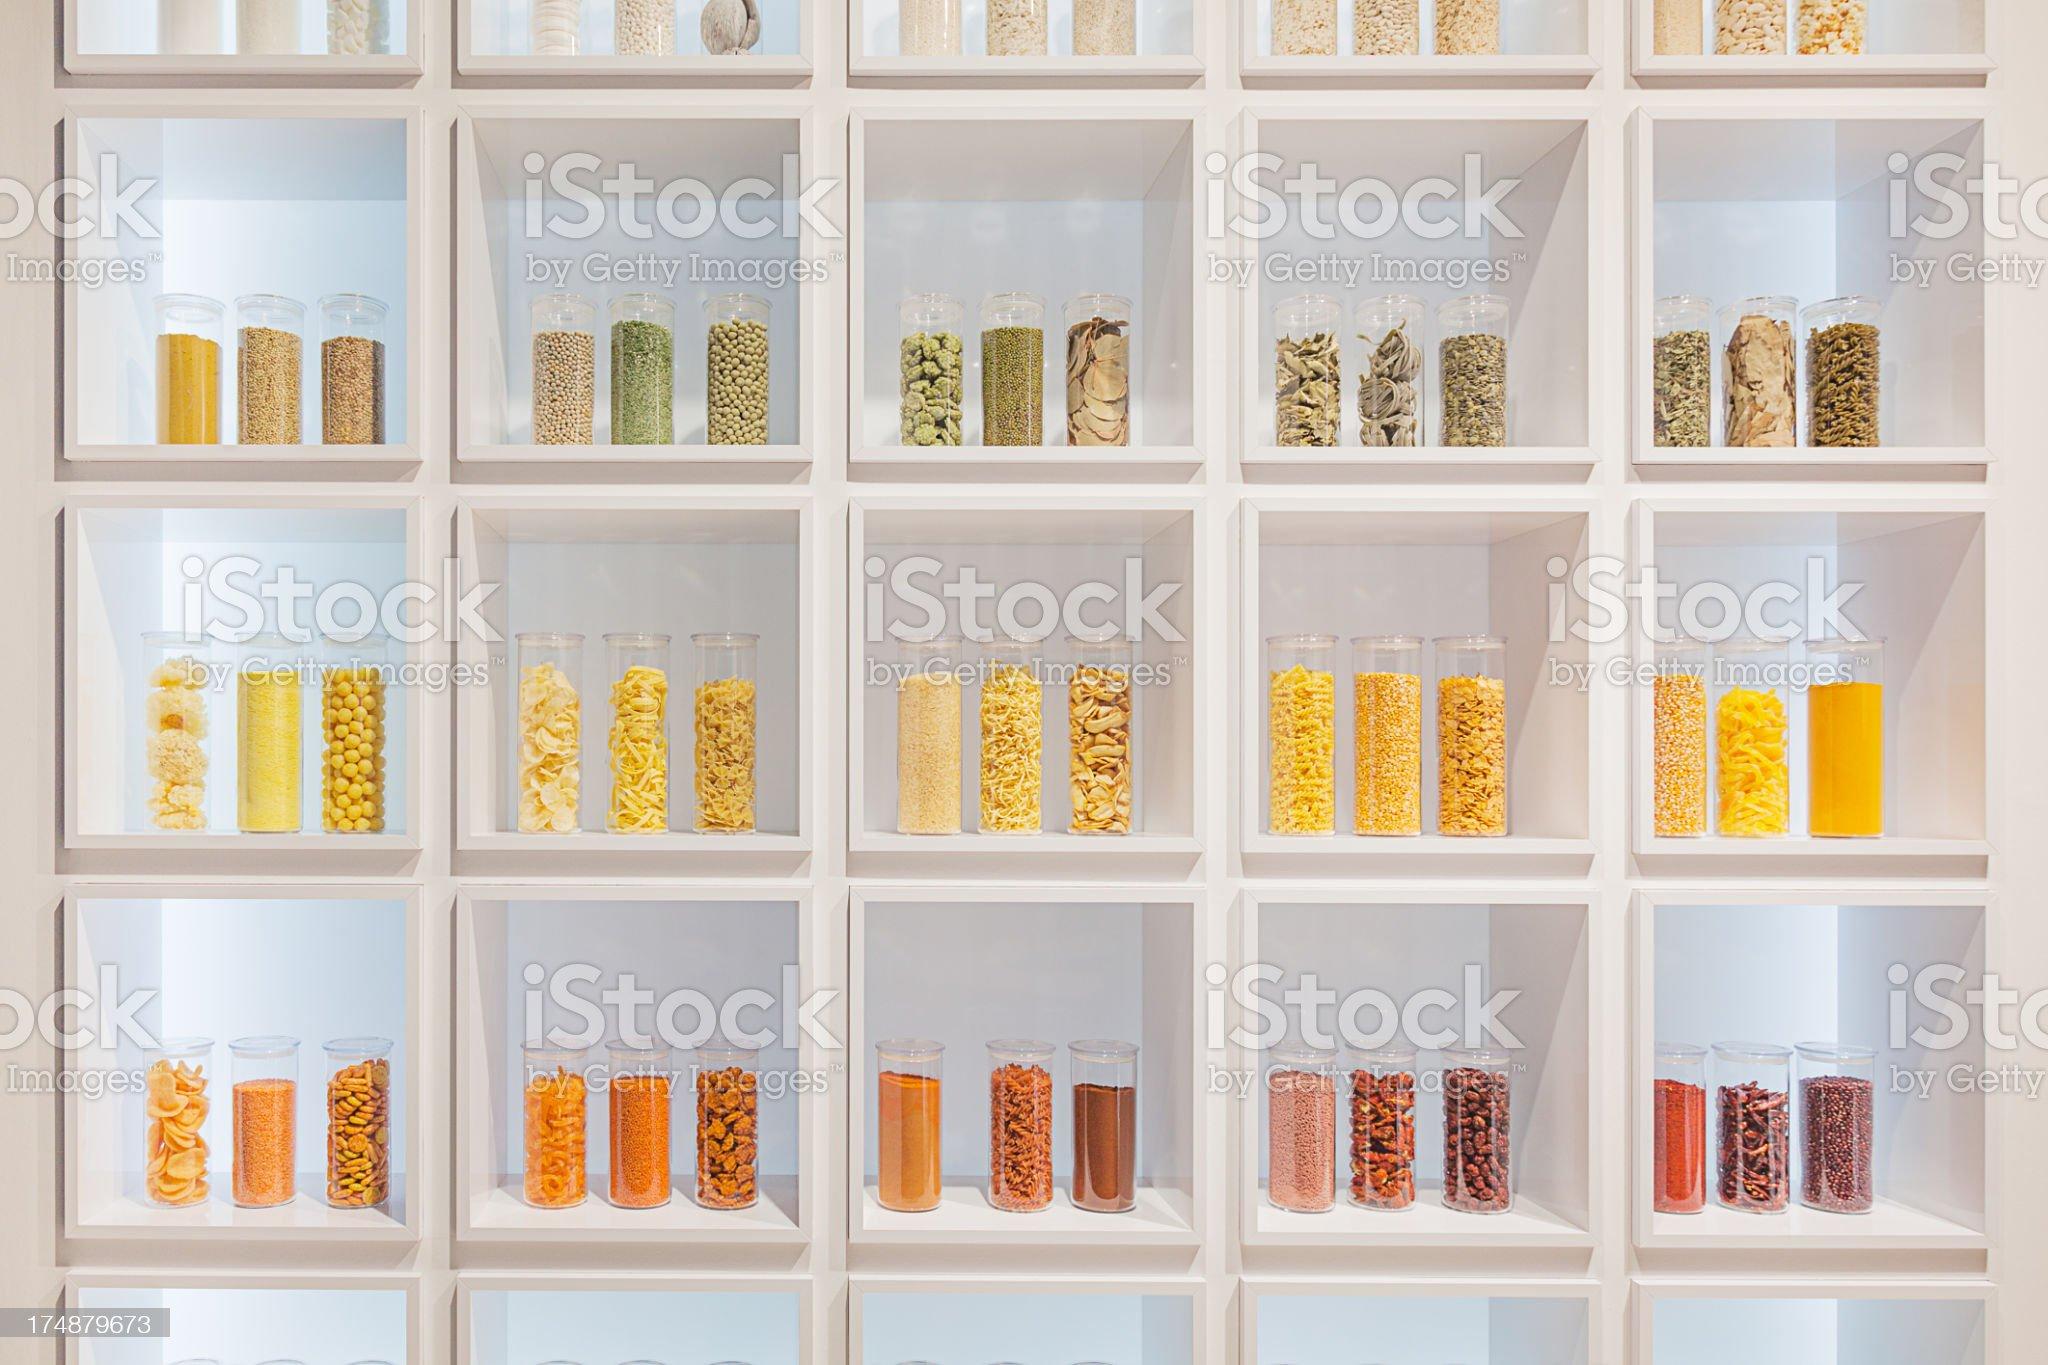 Kitchen herbs royalty-free stock photo